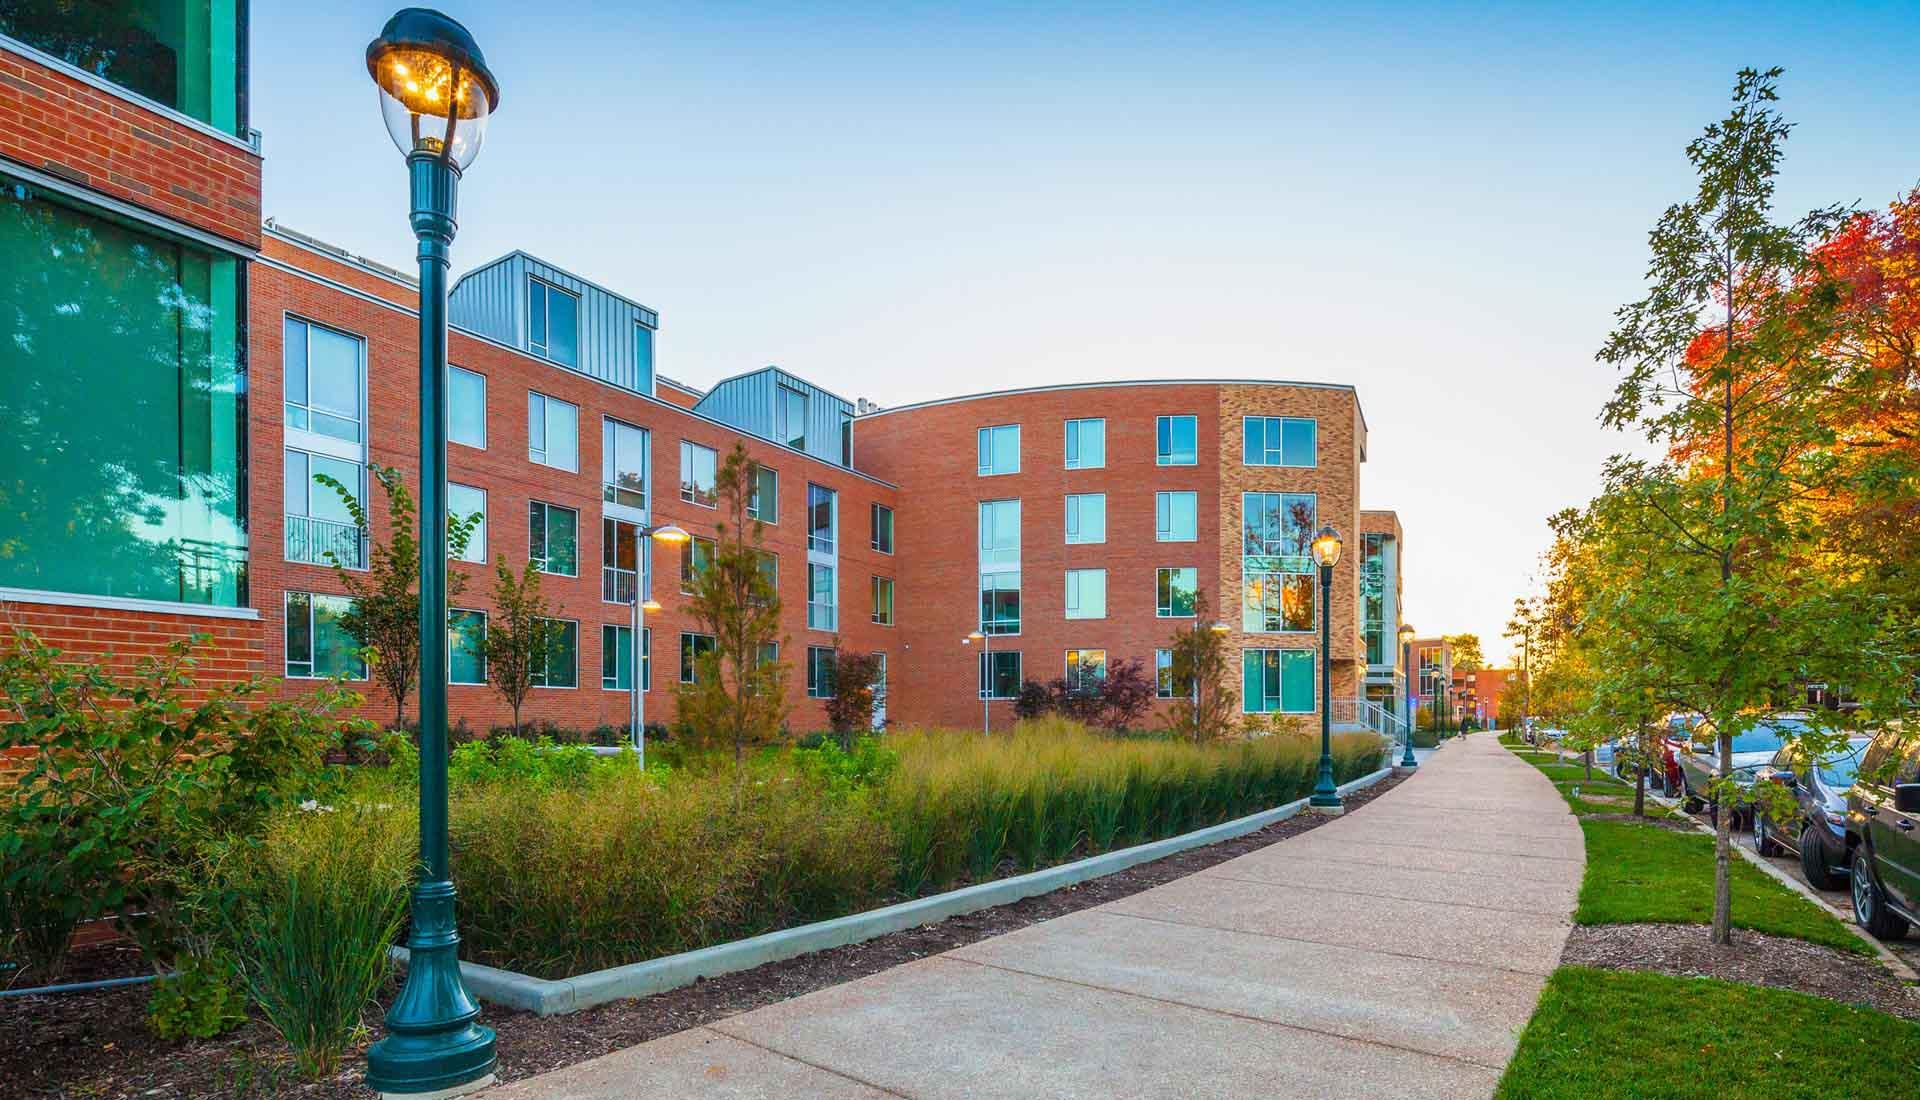 Arbolope Studio | Landscape Architects + Urban Designers | The Lofts of Washington University (Delmar Loop)